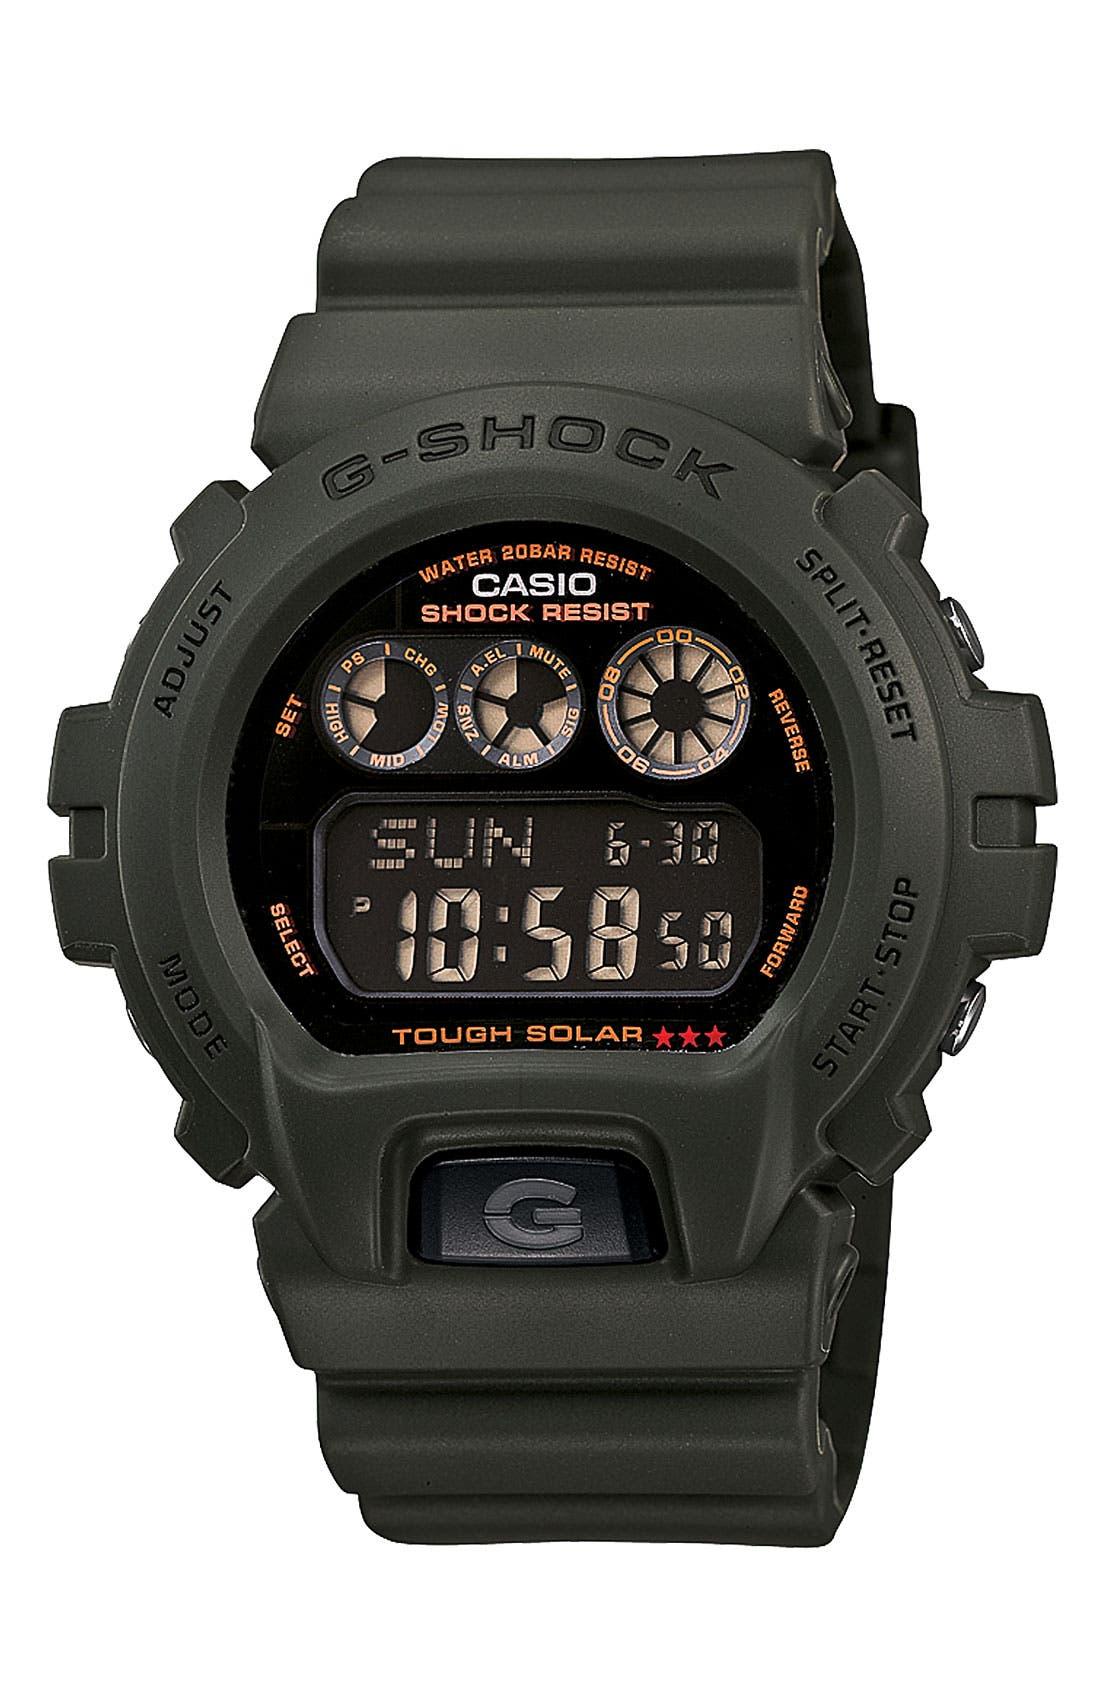 Main Image - G-Shock 'Solar' Digital Watch, 46mm x 43mm